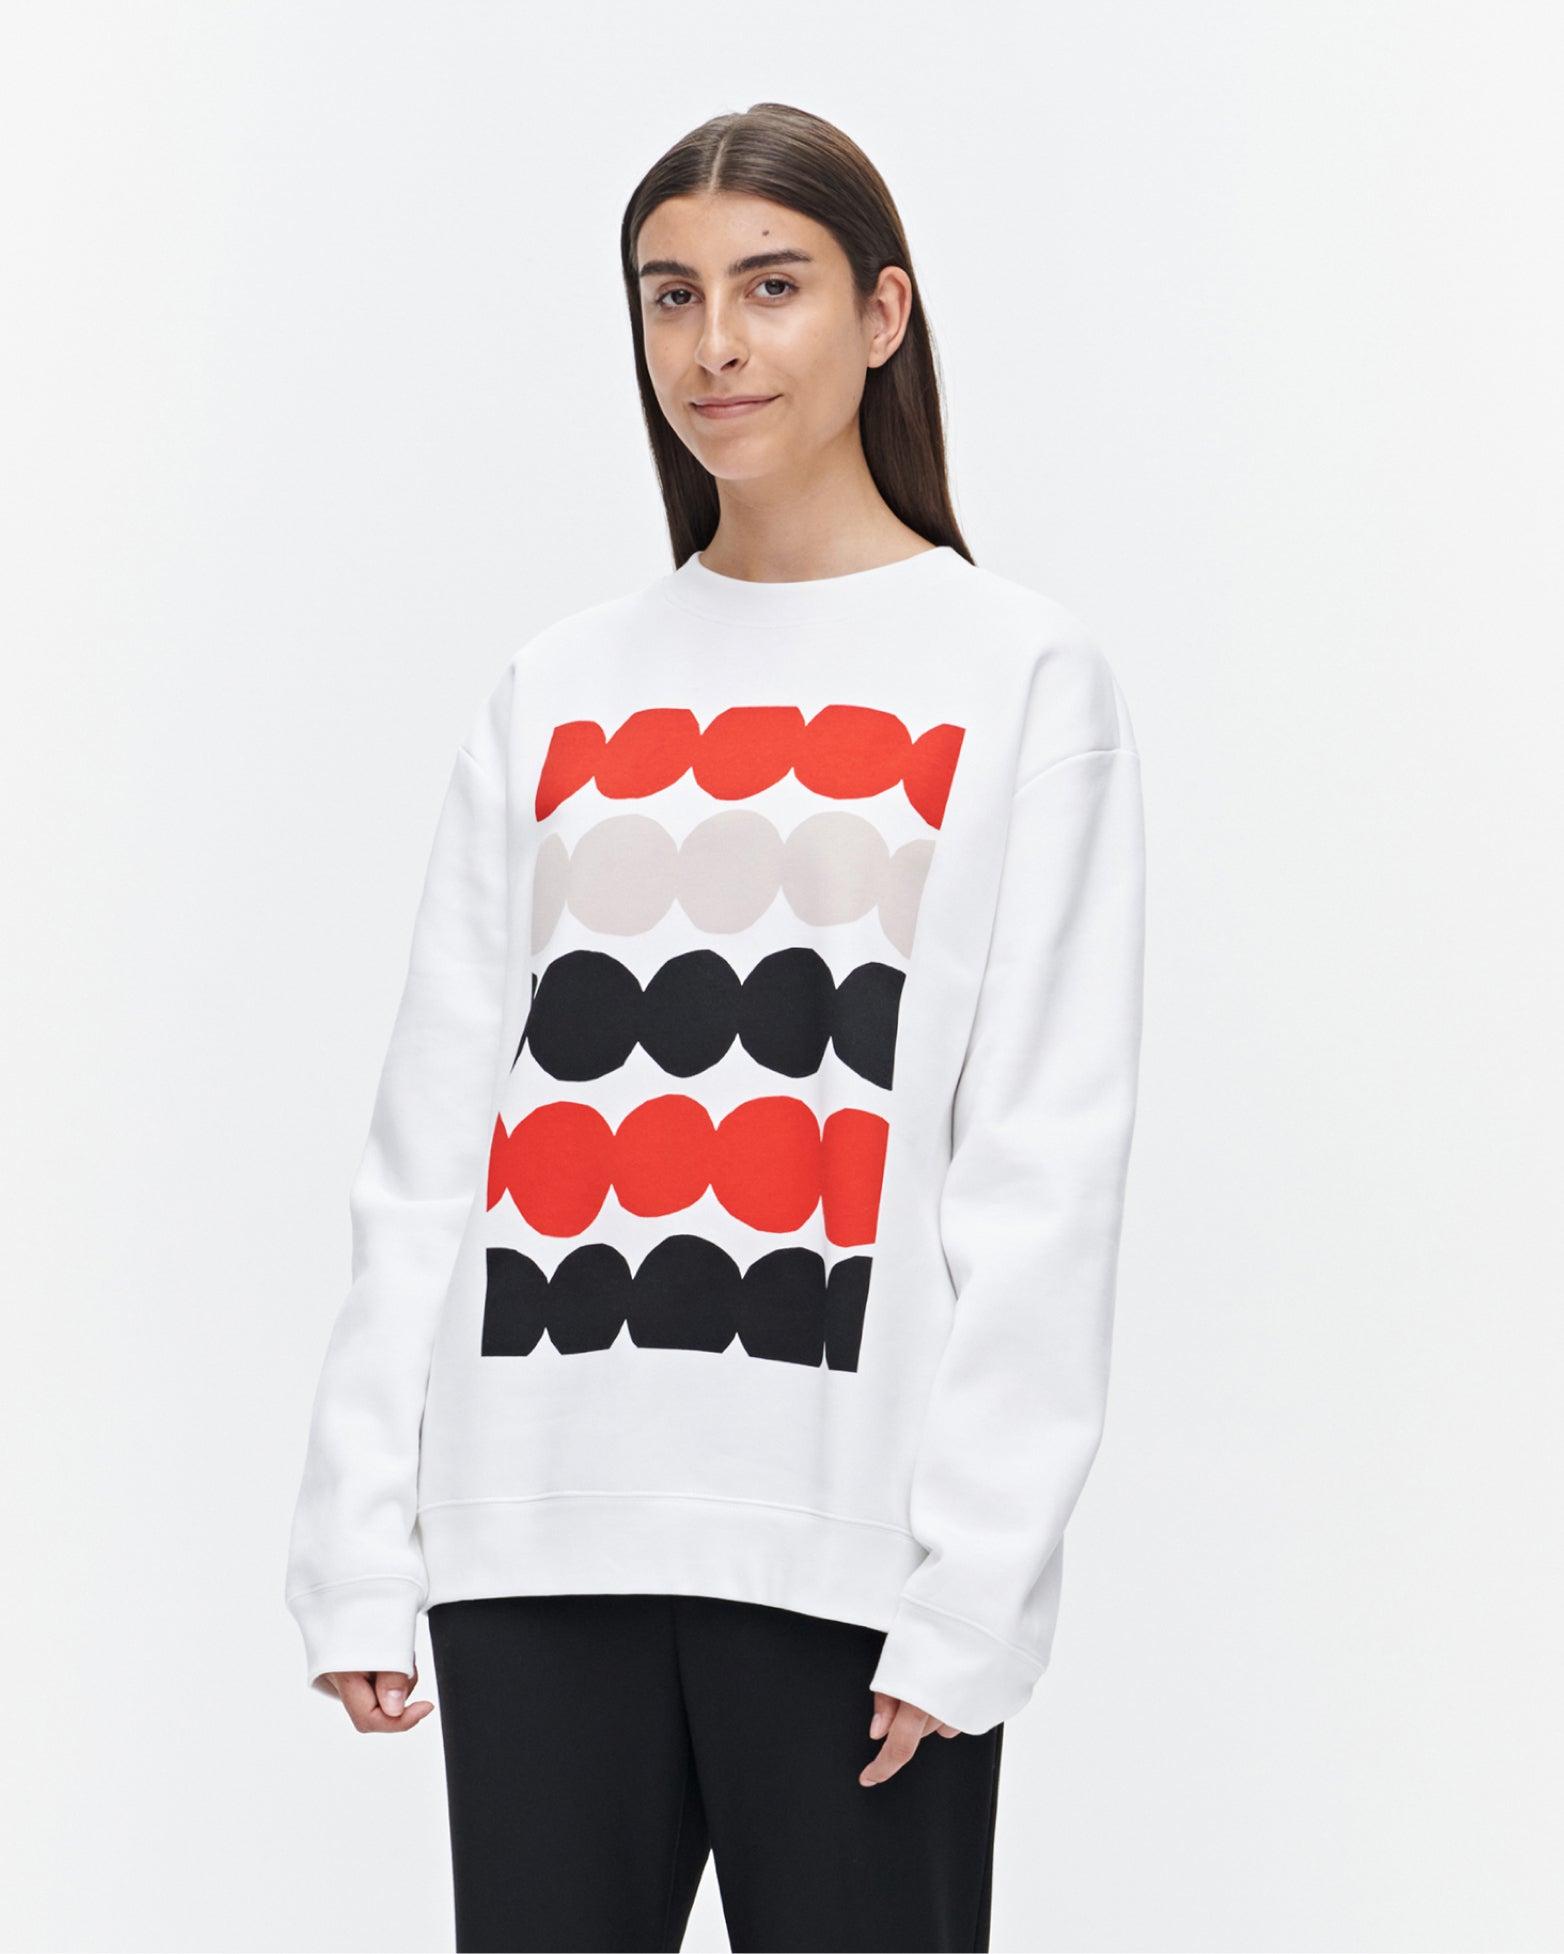 Marimekko Lohkare sweater